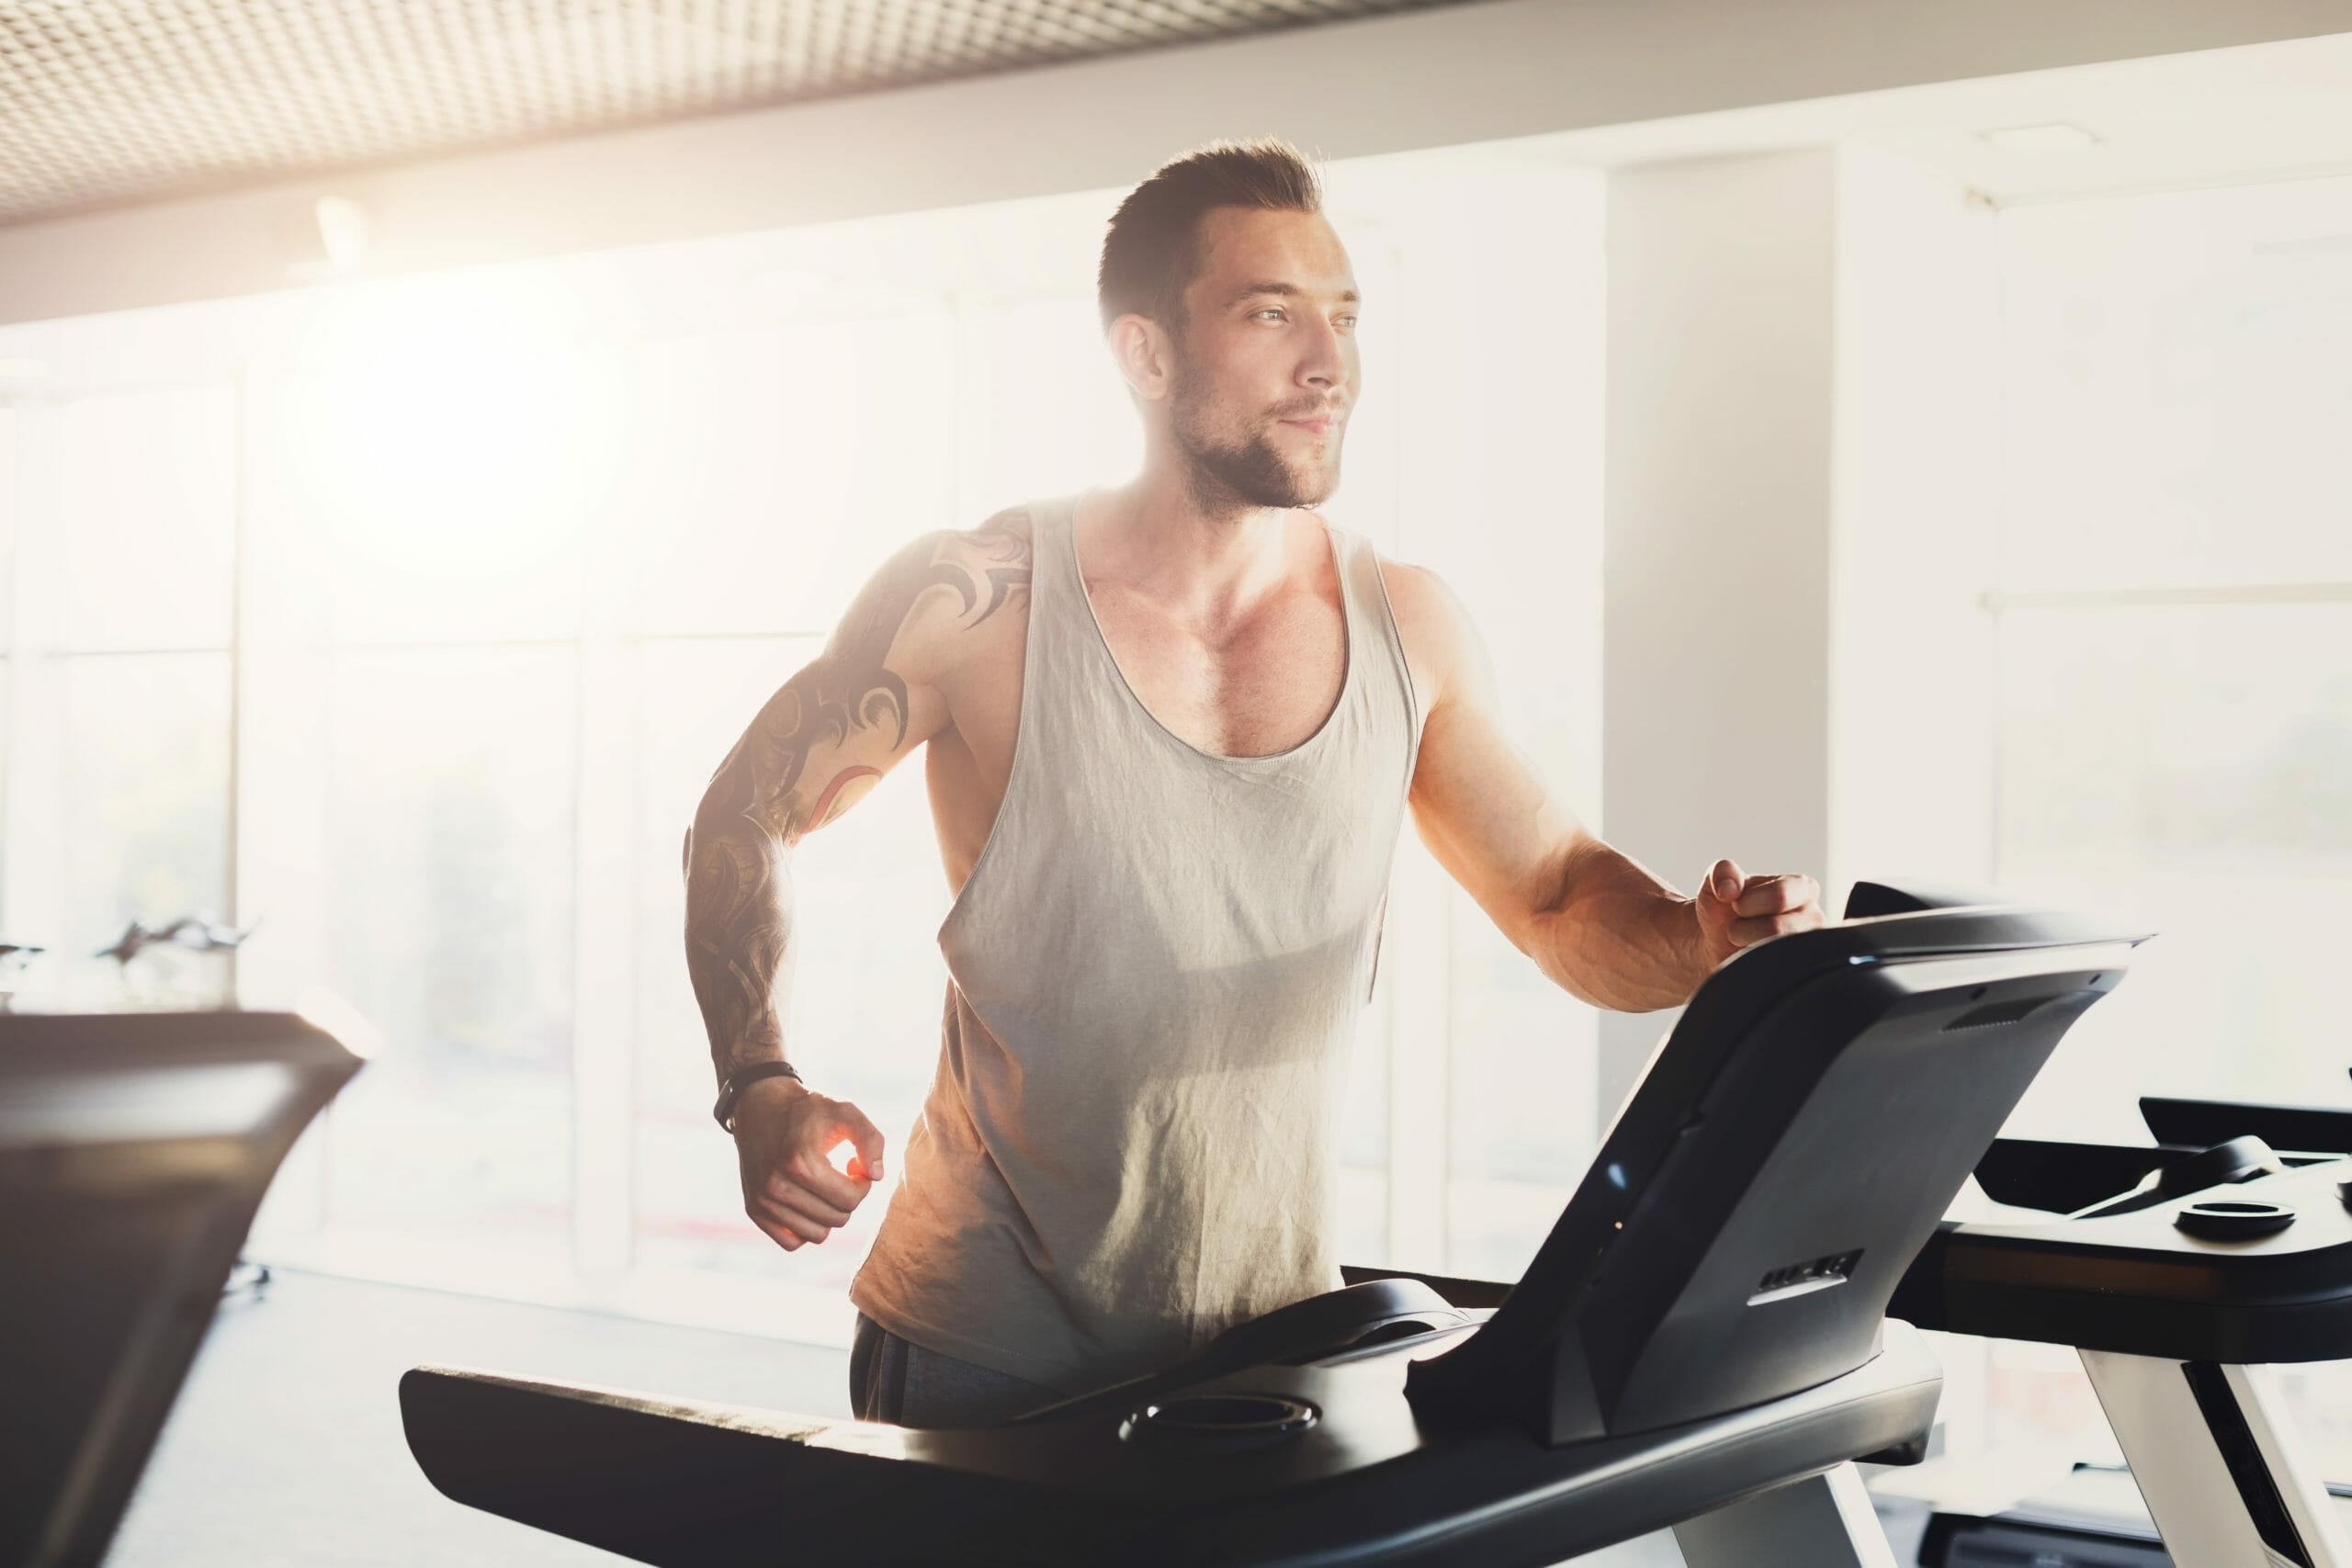 lifespan fitness tr5500i treadmill review